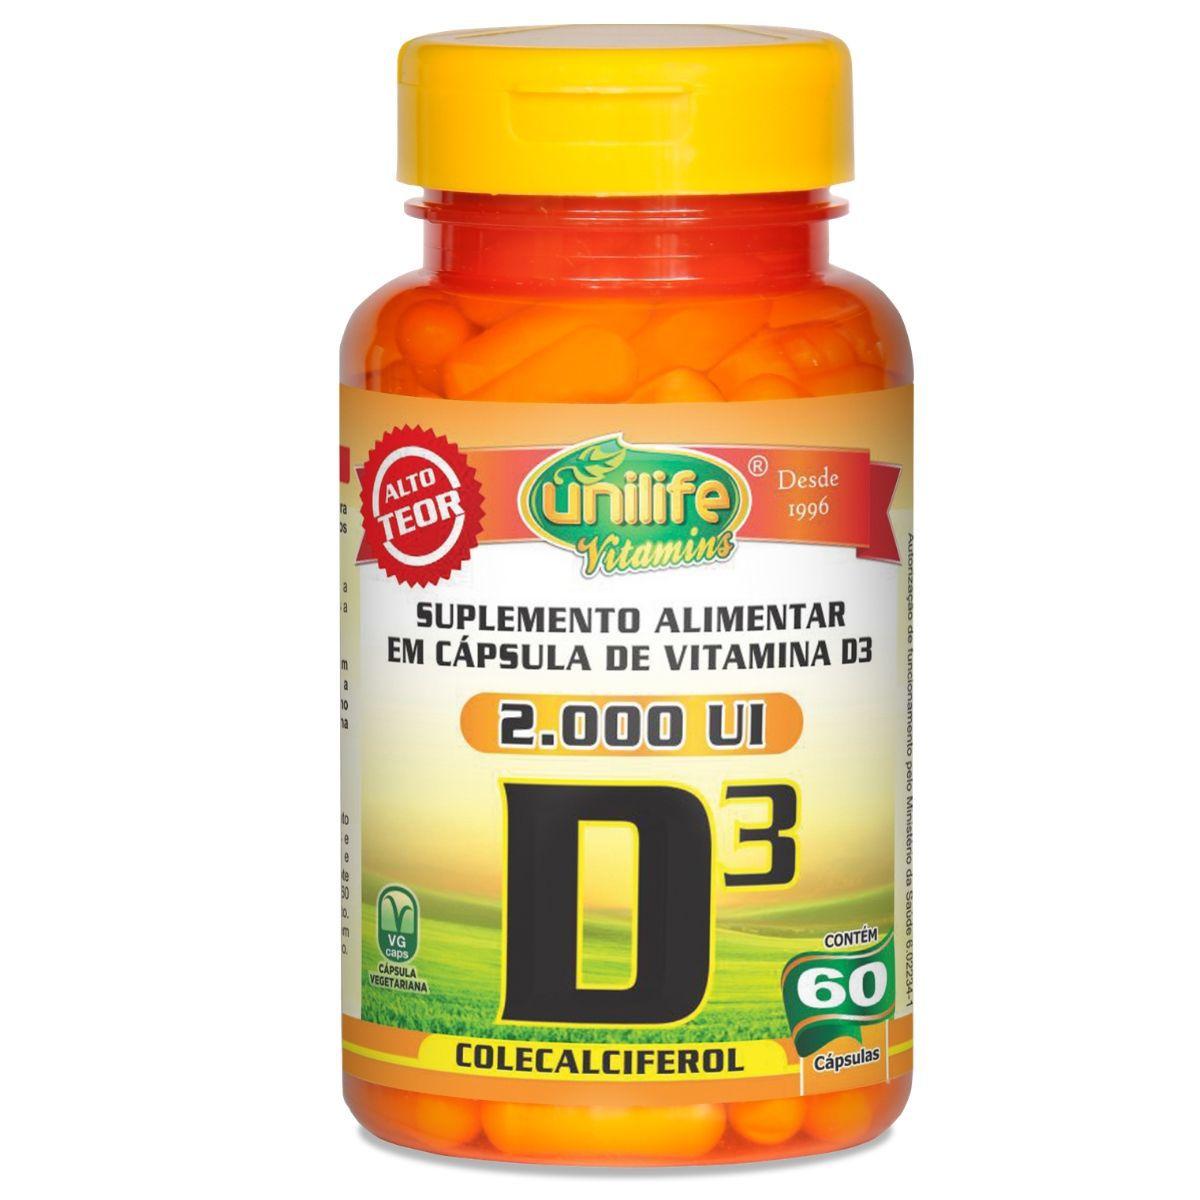 Vitamina D3 Colecalciferol 60 Cápsulas - Unilife